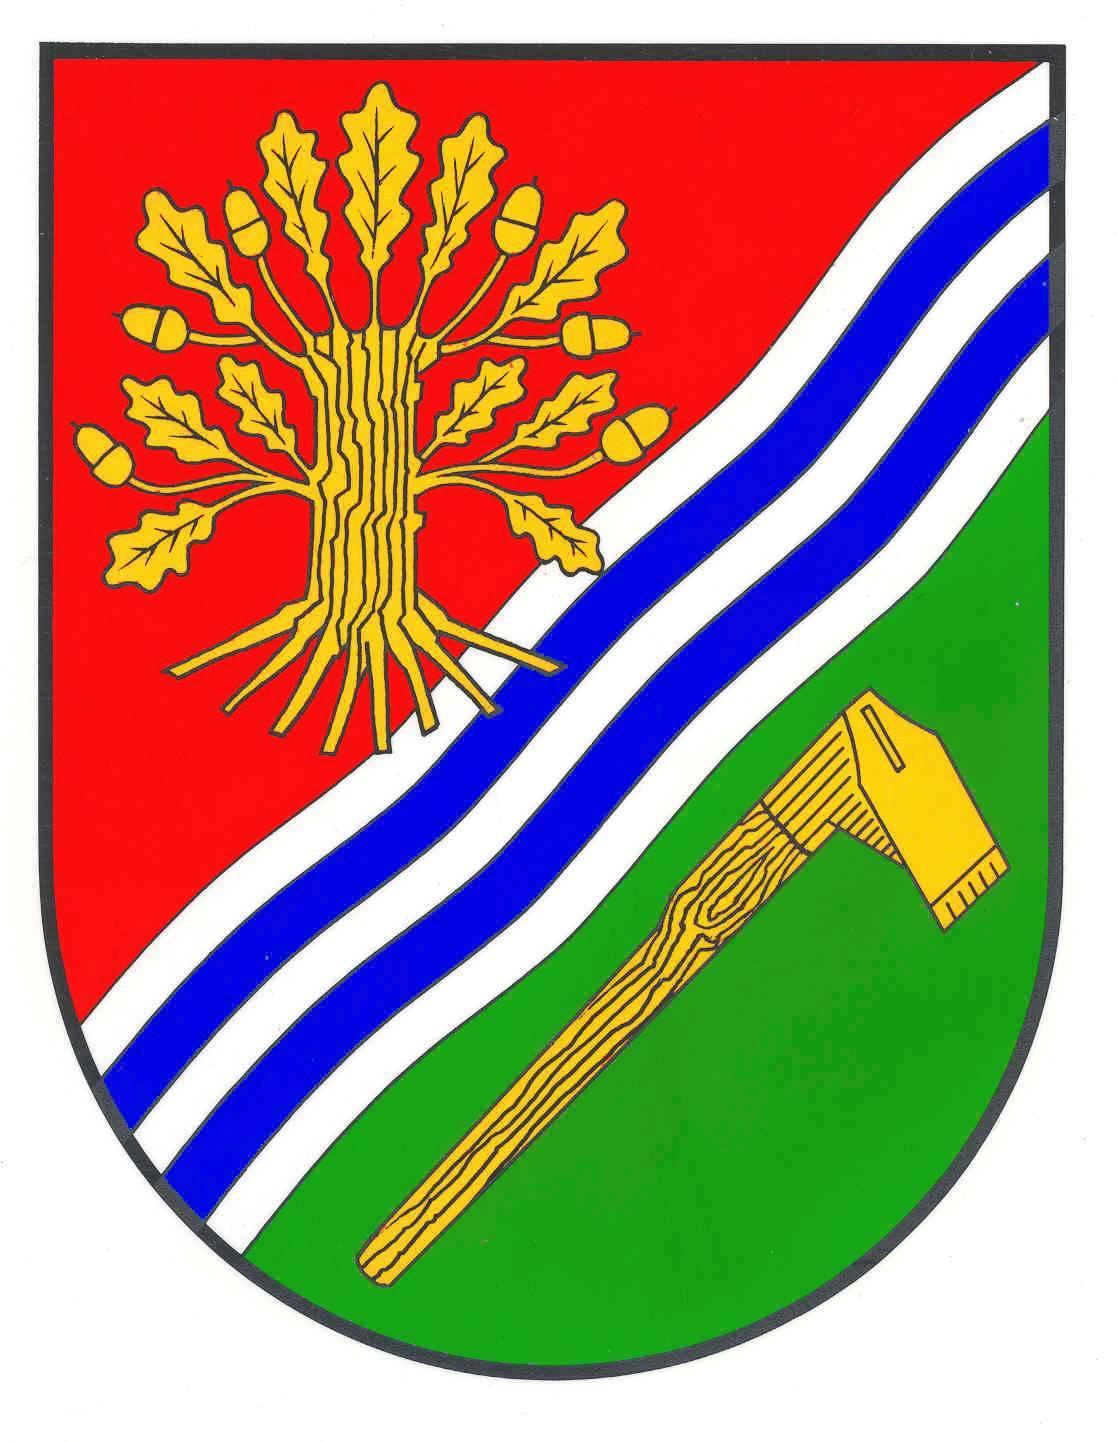 Wappen GemeindeKasseedorf, Kreis Ostholstein